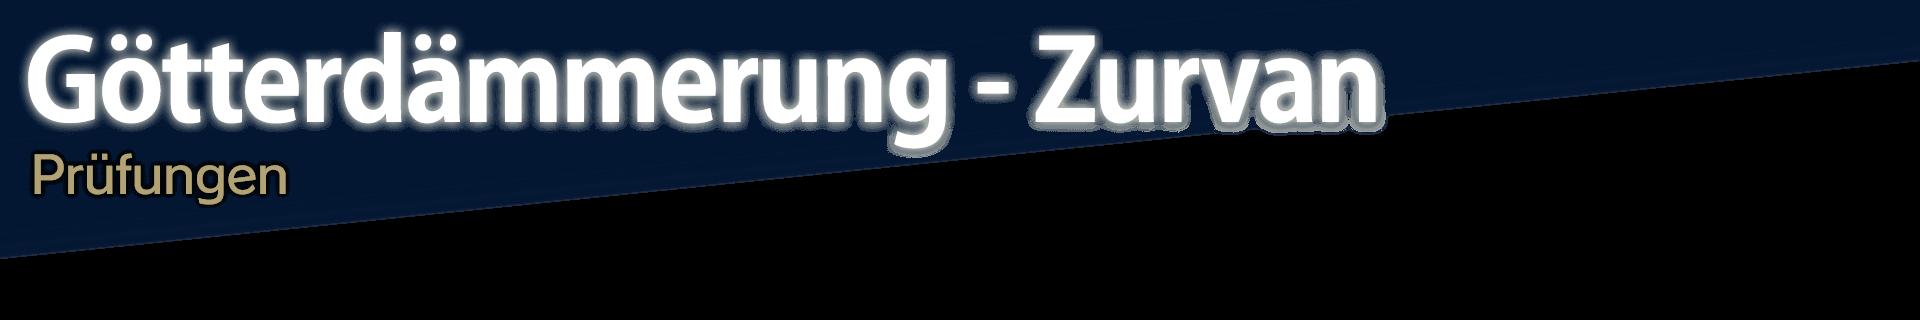 Götterdämmerung - Zurvan